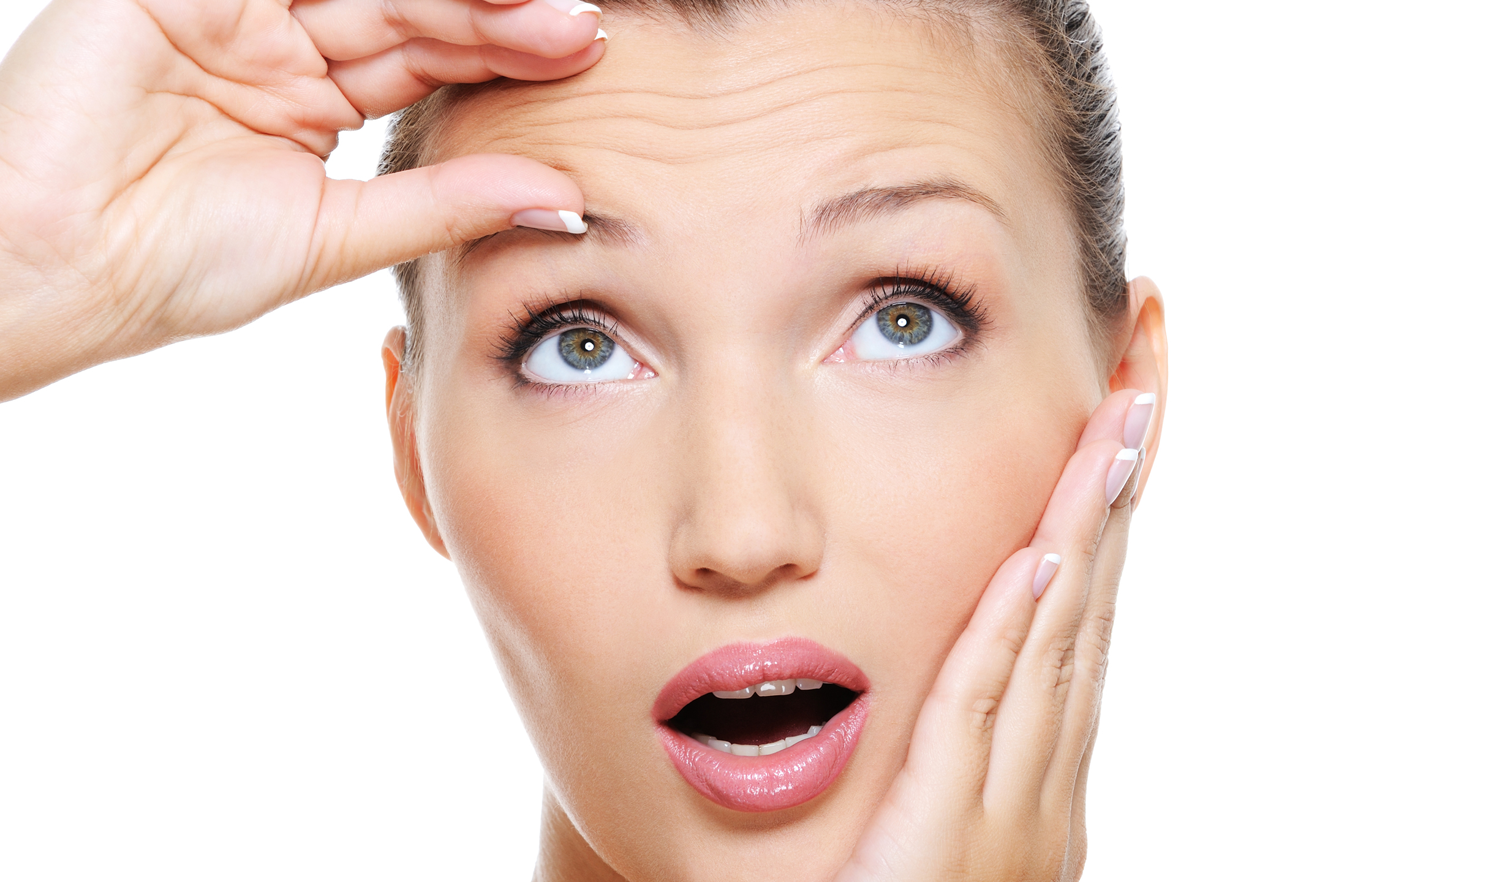 Уход за кожей лица и тела в домашних условиях